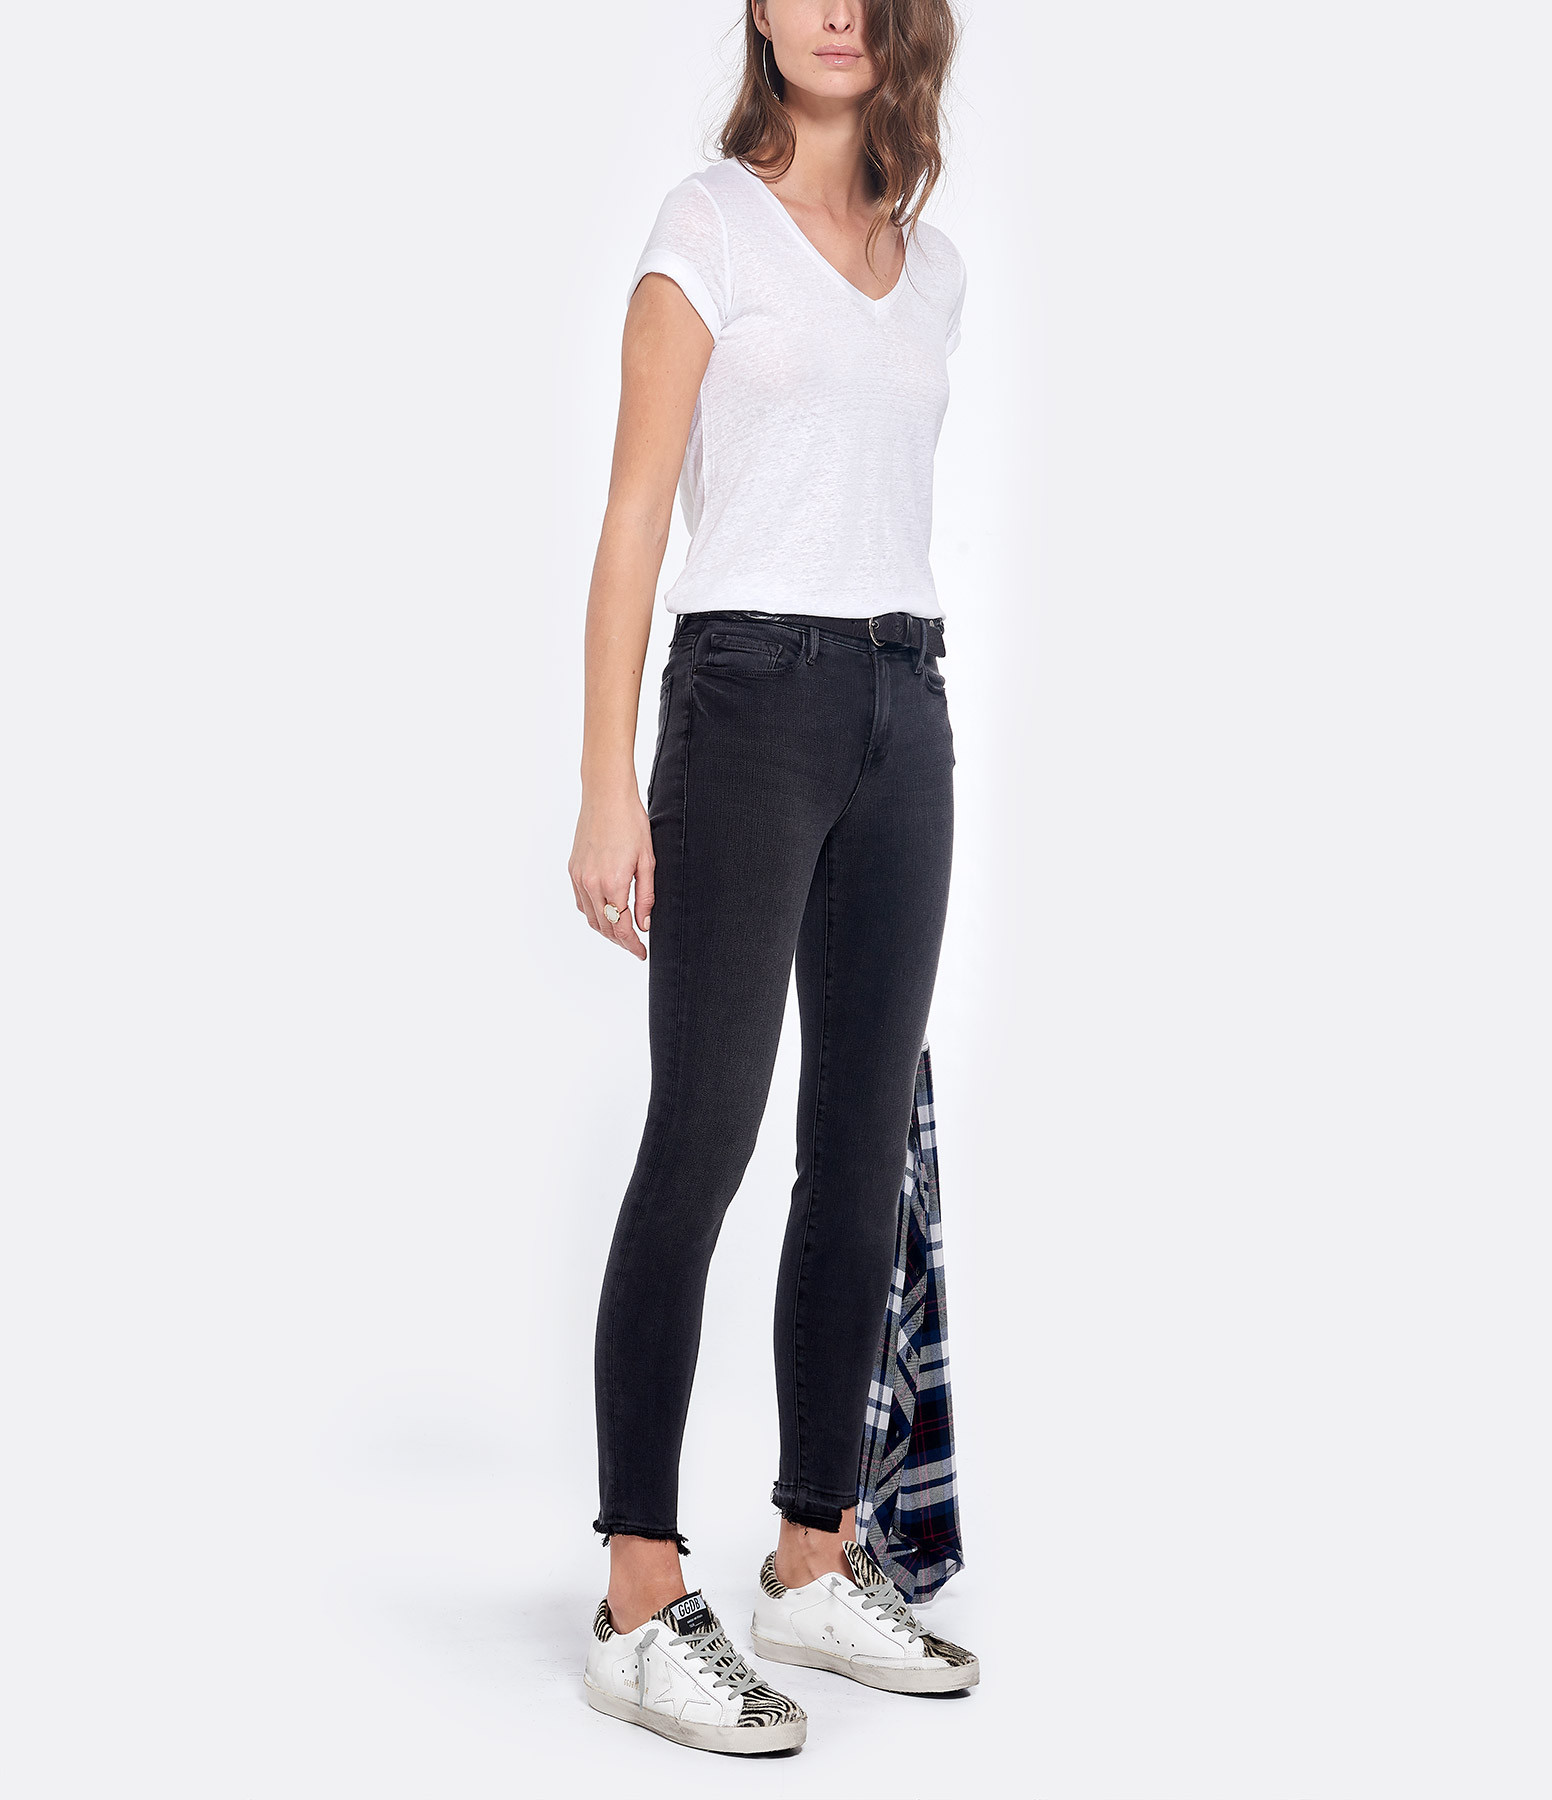 MAJESTIC FILATURES - Tee-shirt Col V Lin Blanc